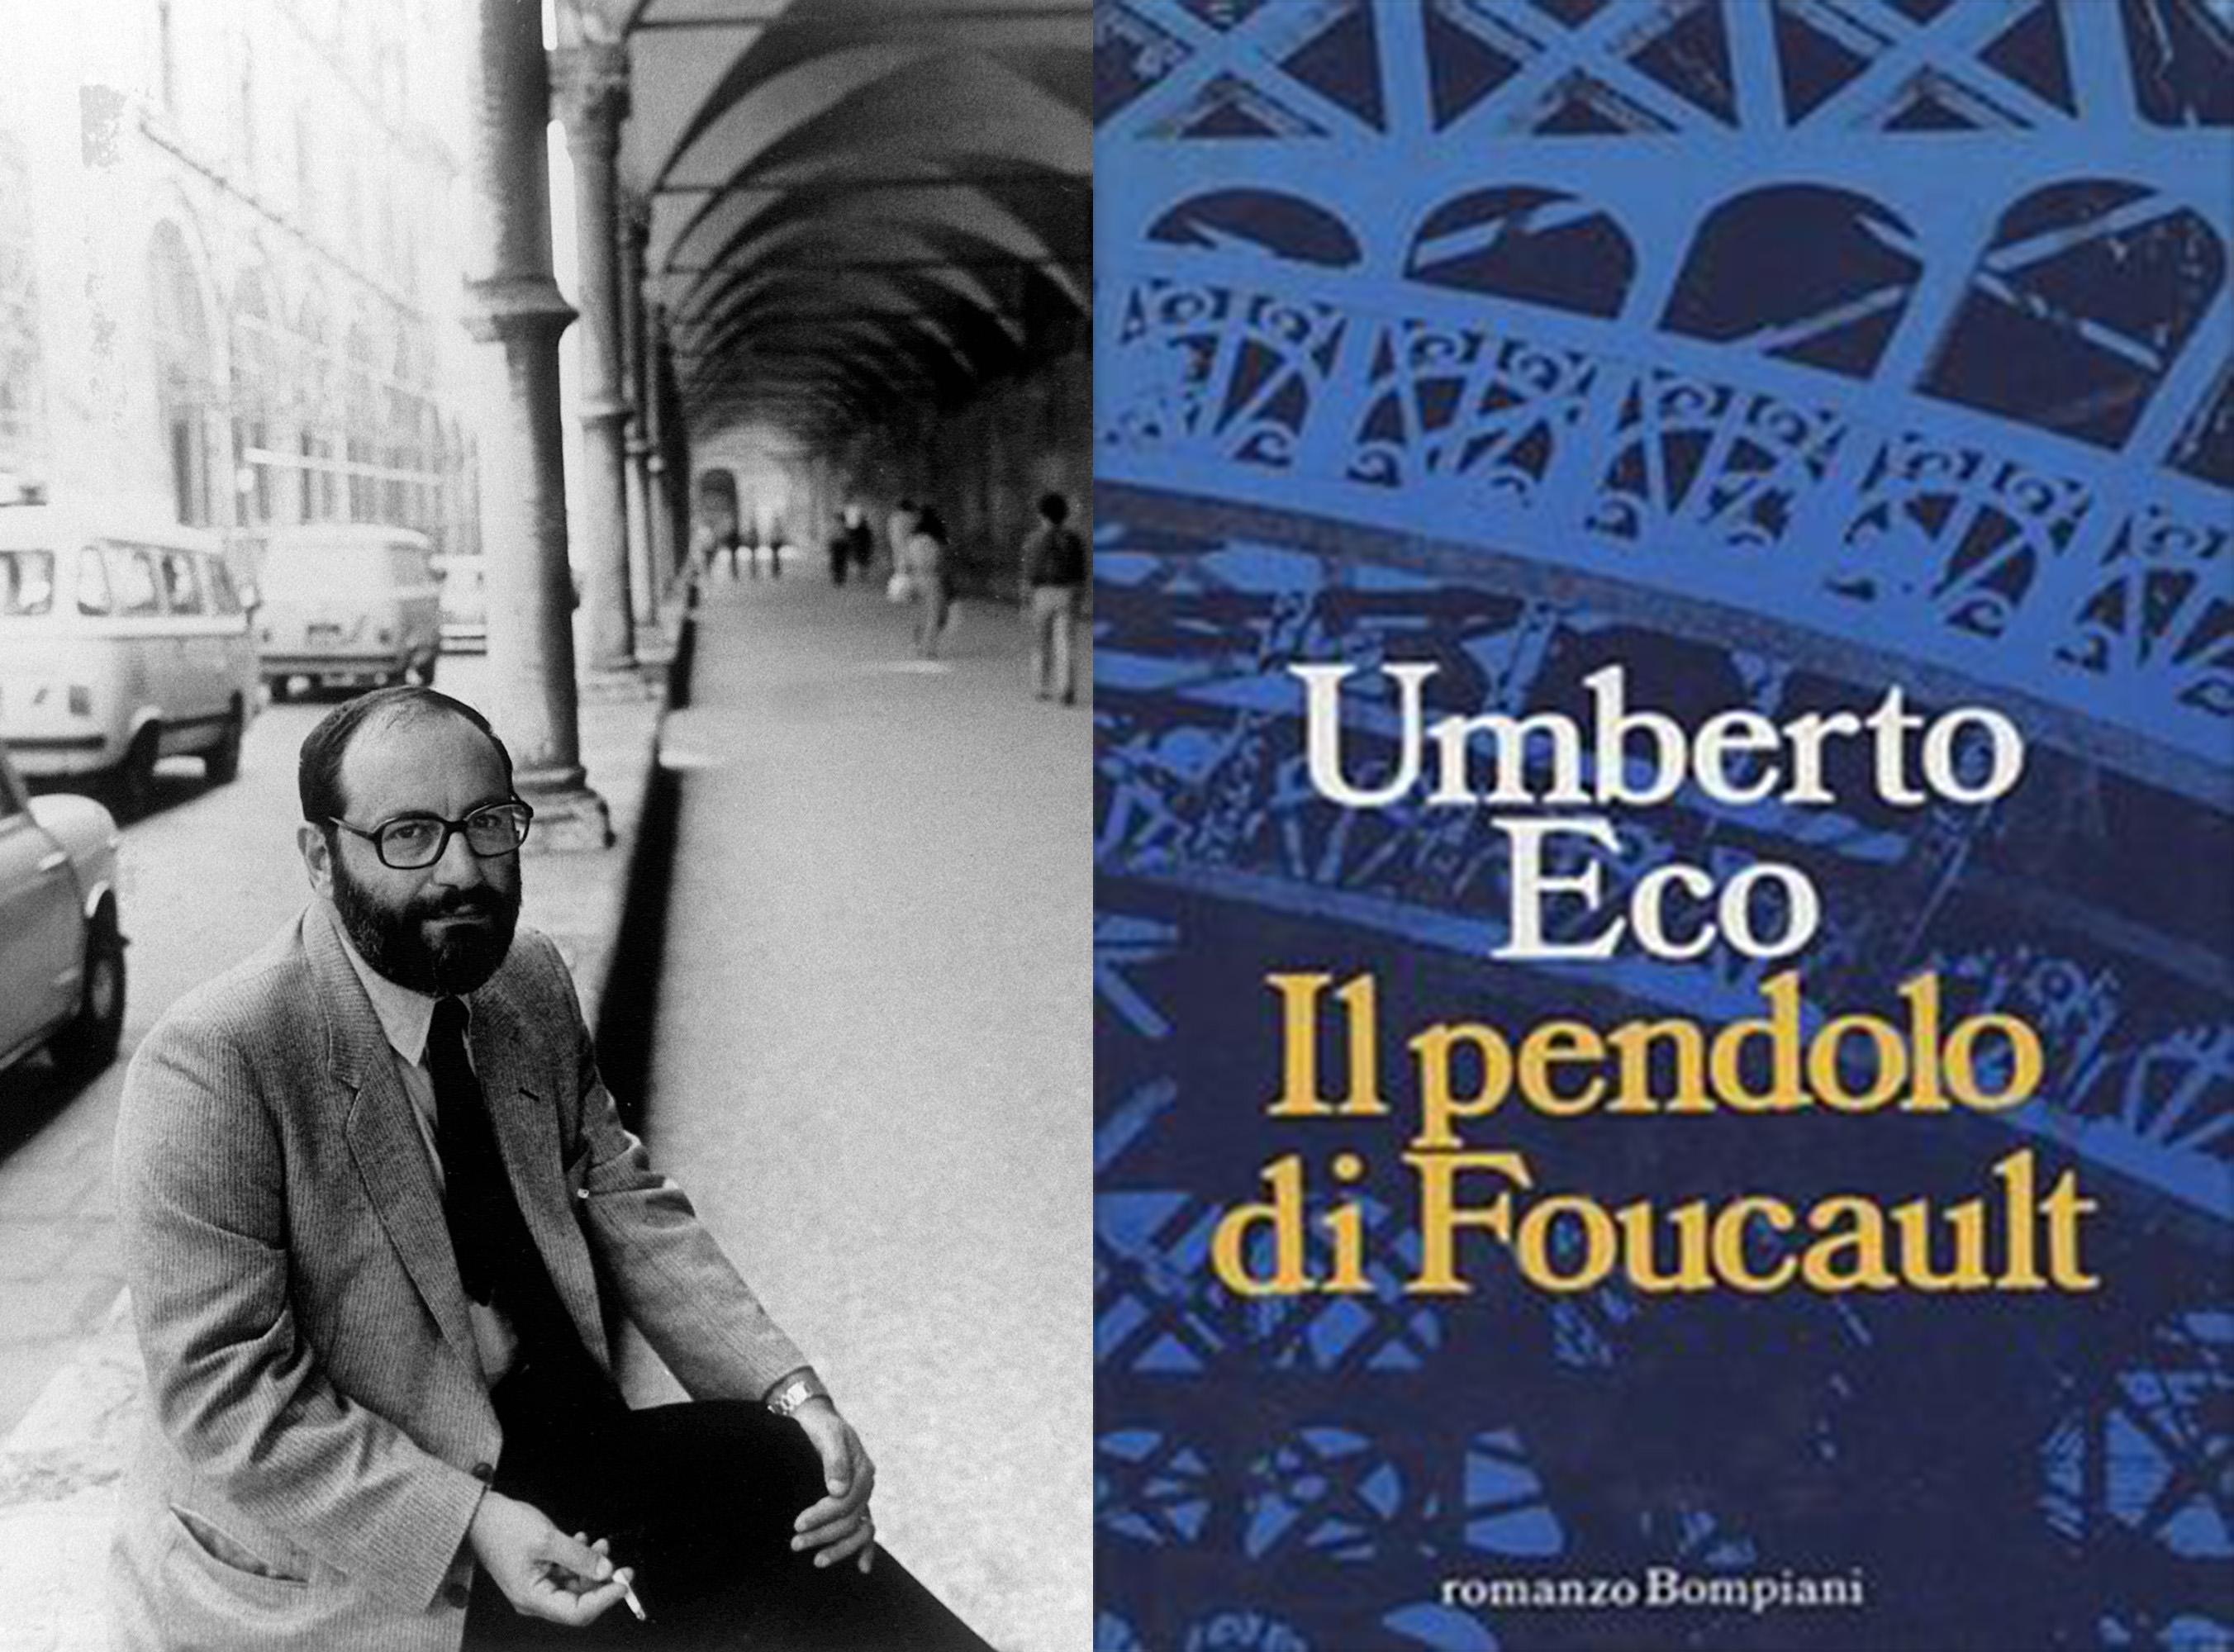 Umberto Eco Foucault's Pendulum